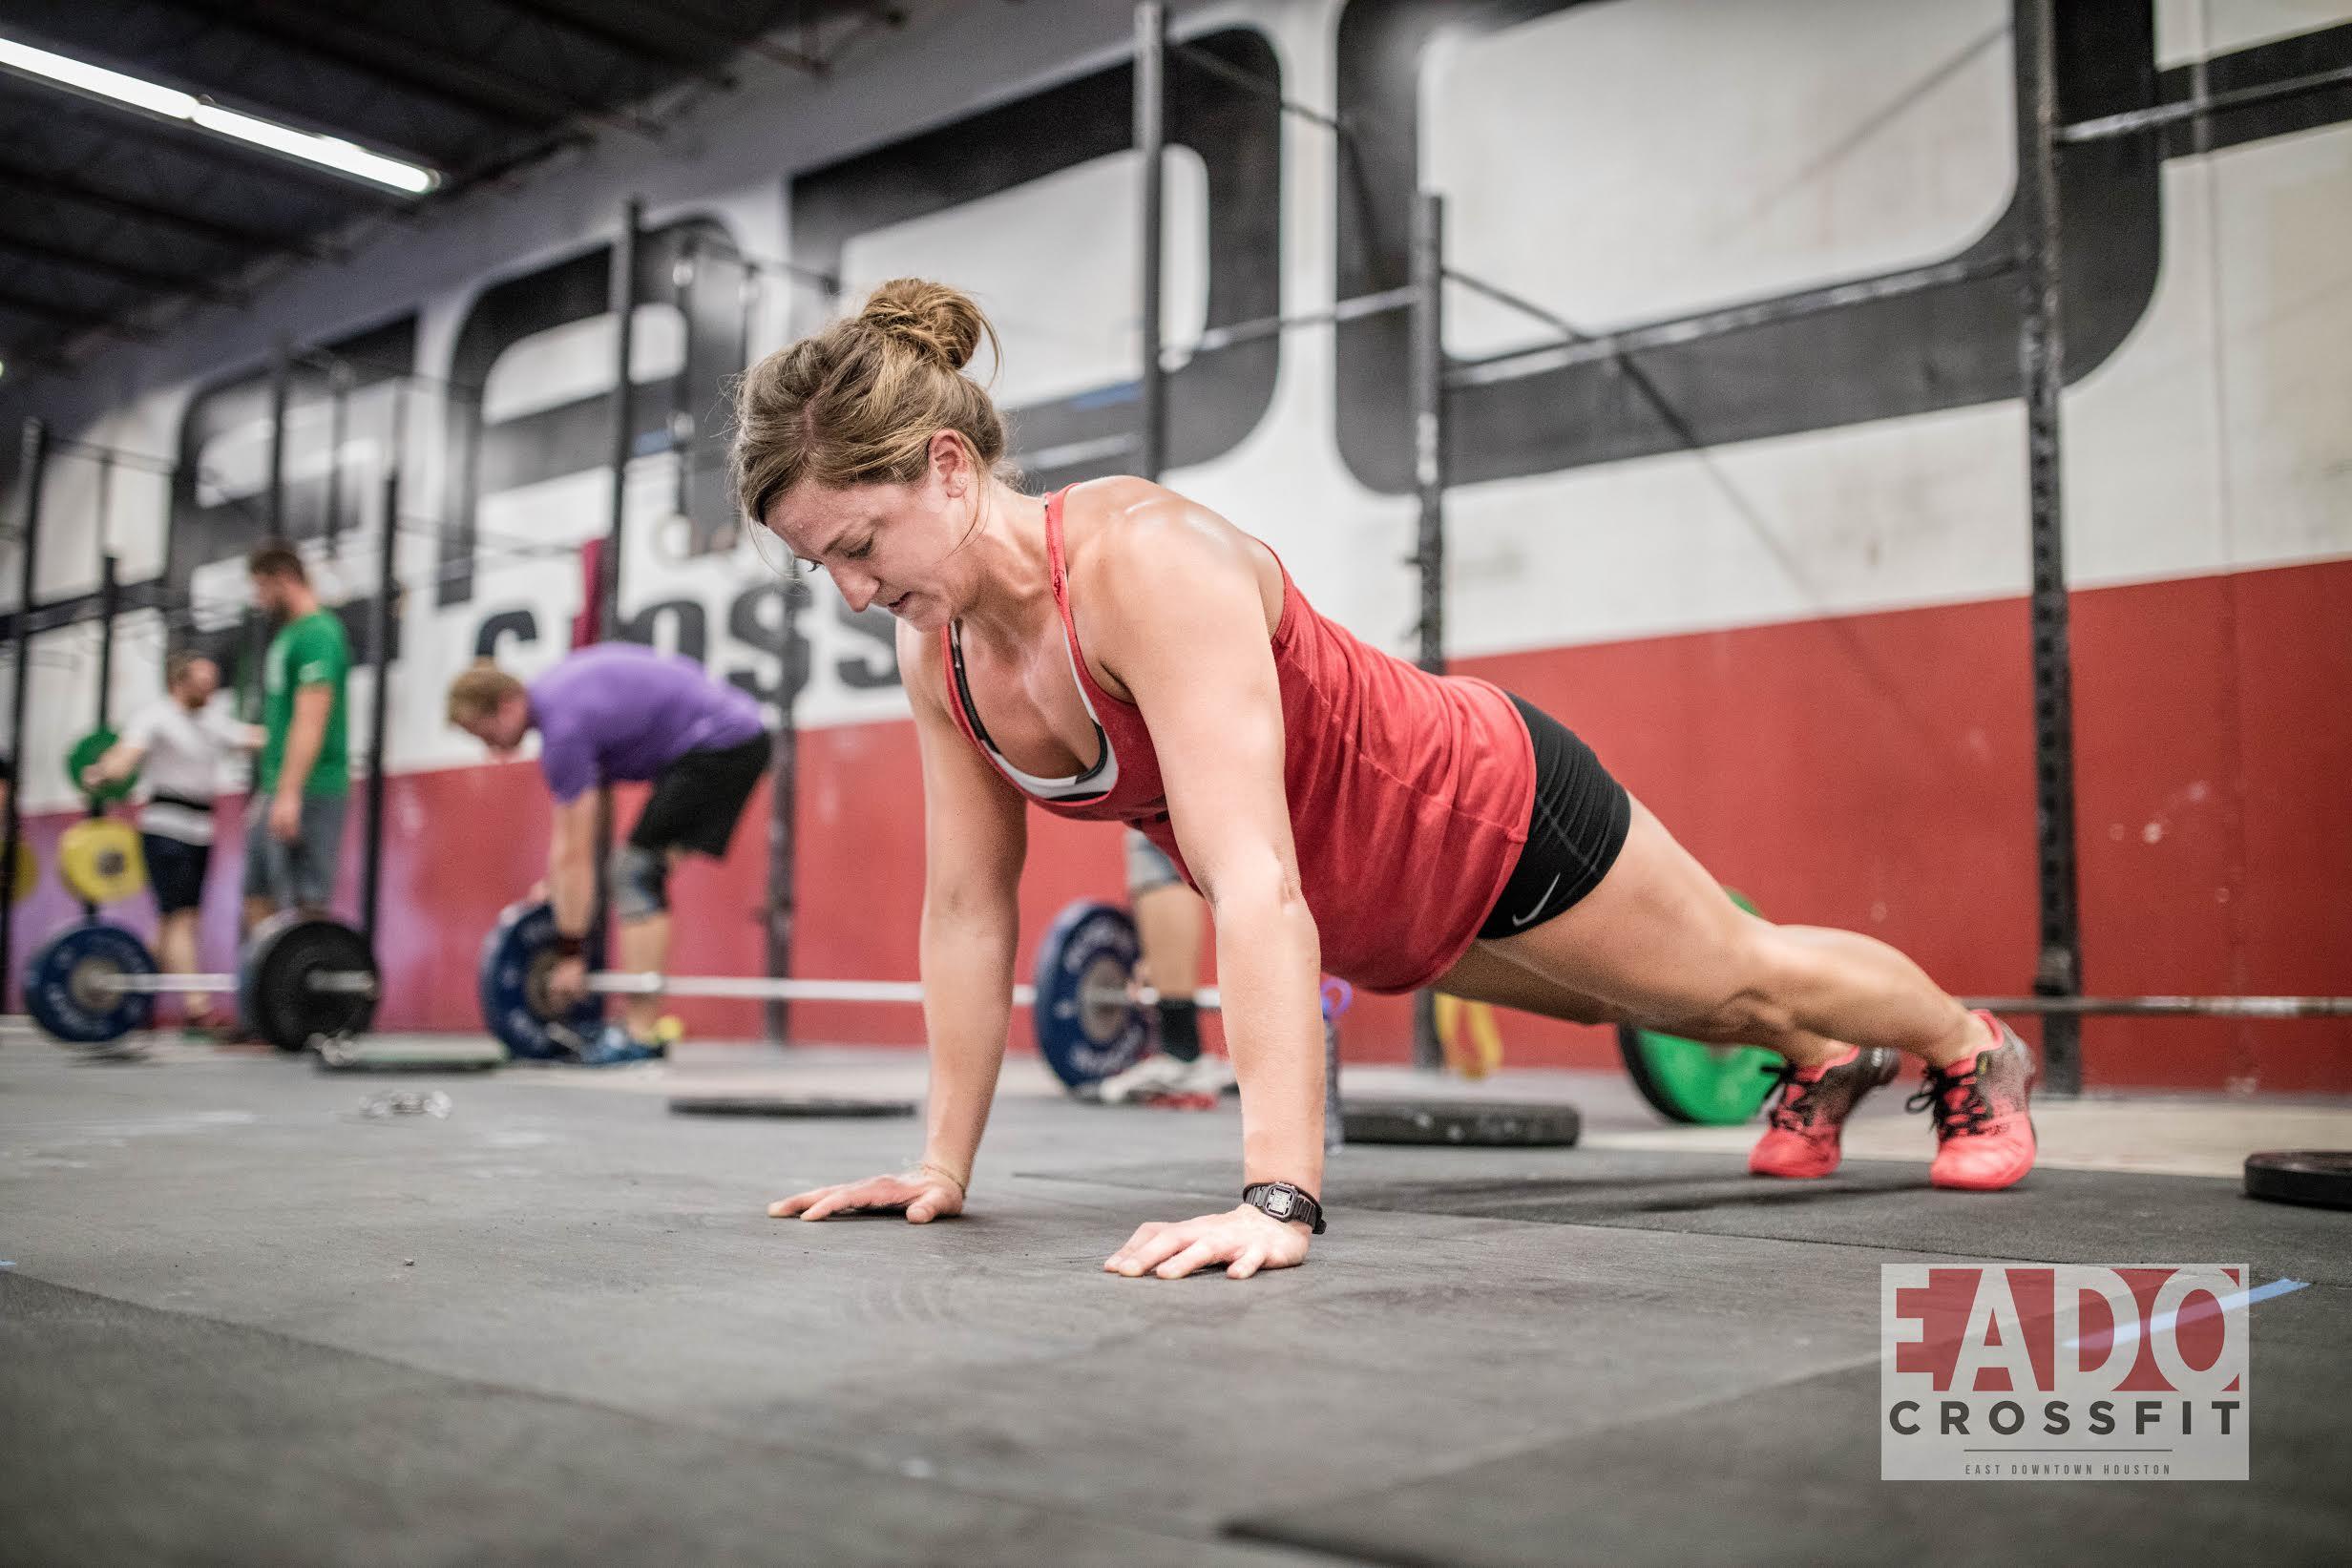 EaDo Elite Athlete Sara Fish doing pushups in a WOD 3 weeks ago.  Photo Credit: Sierra Prime